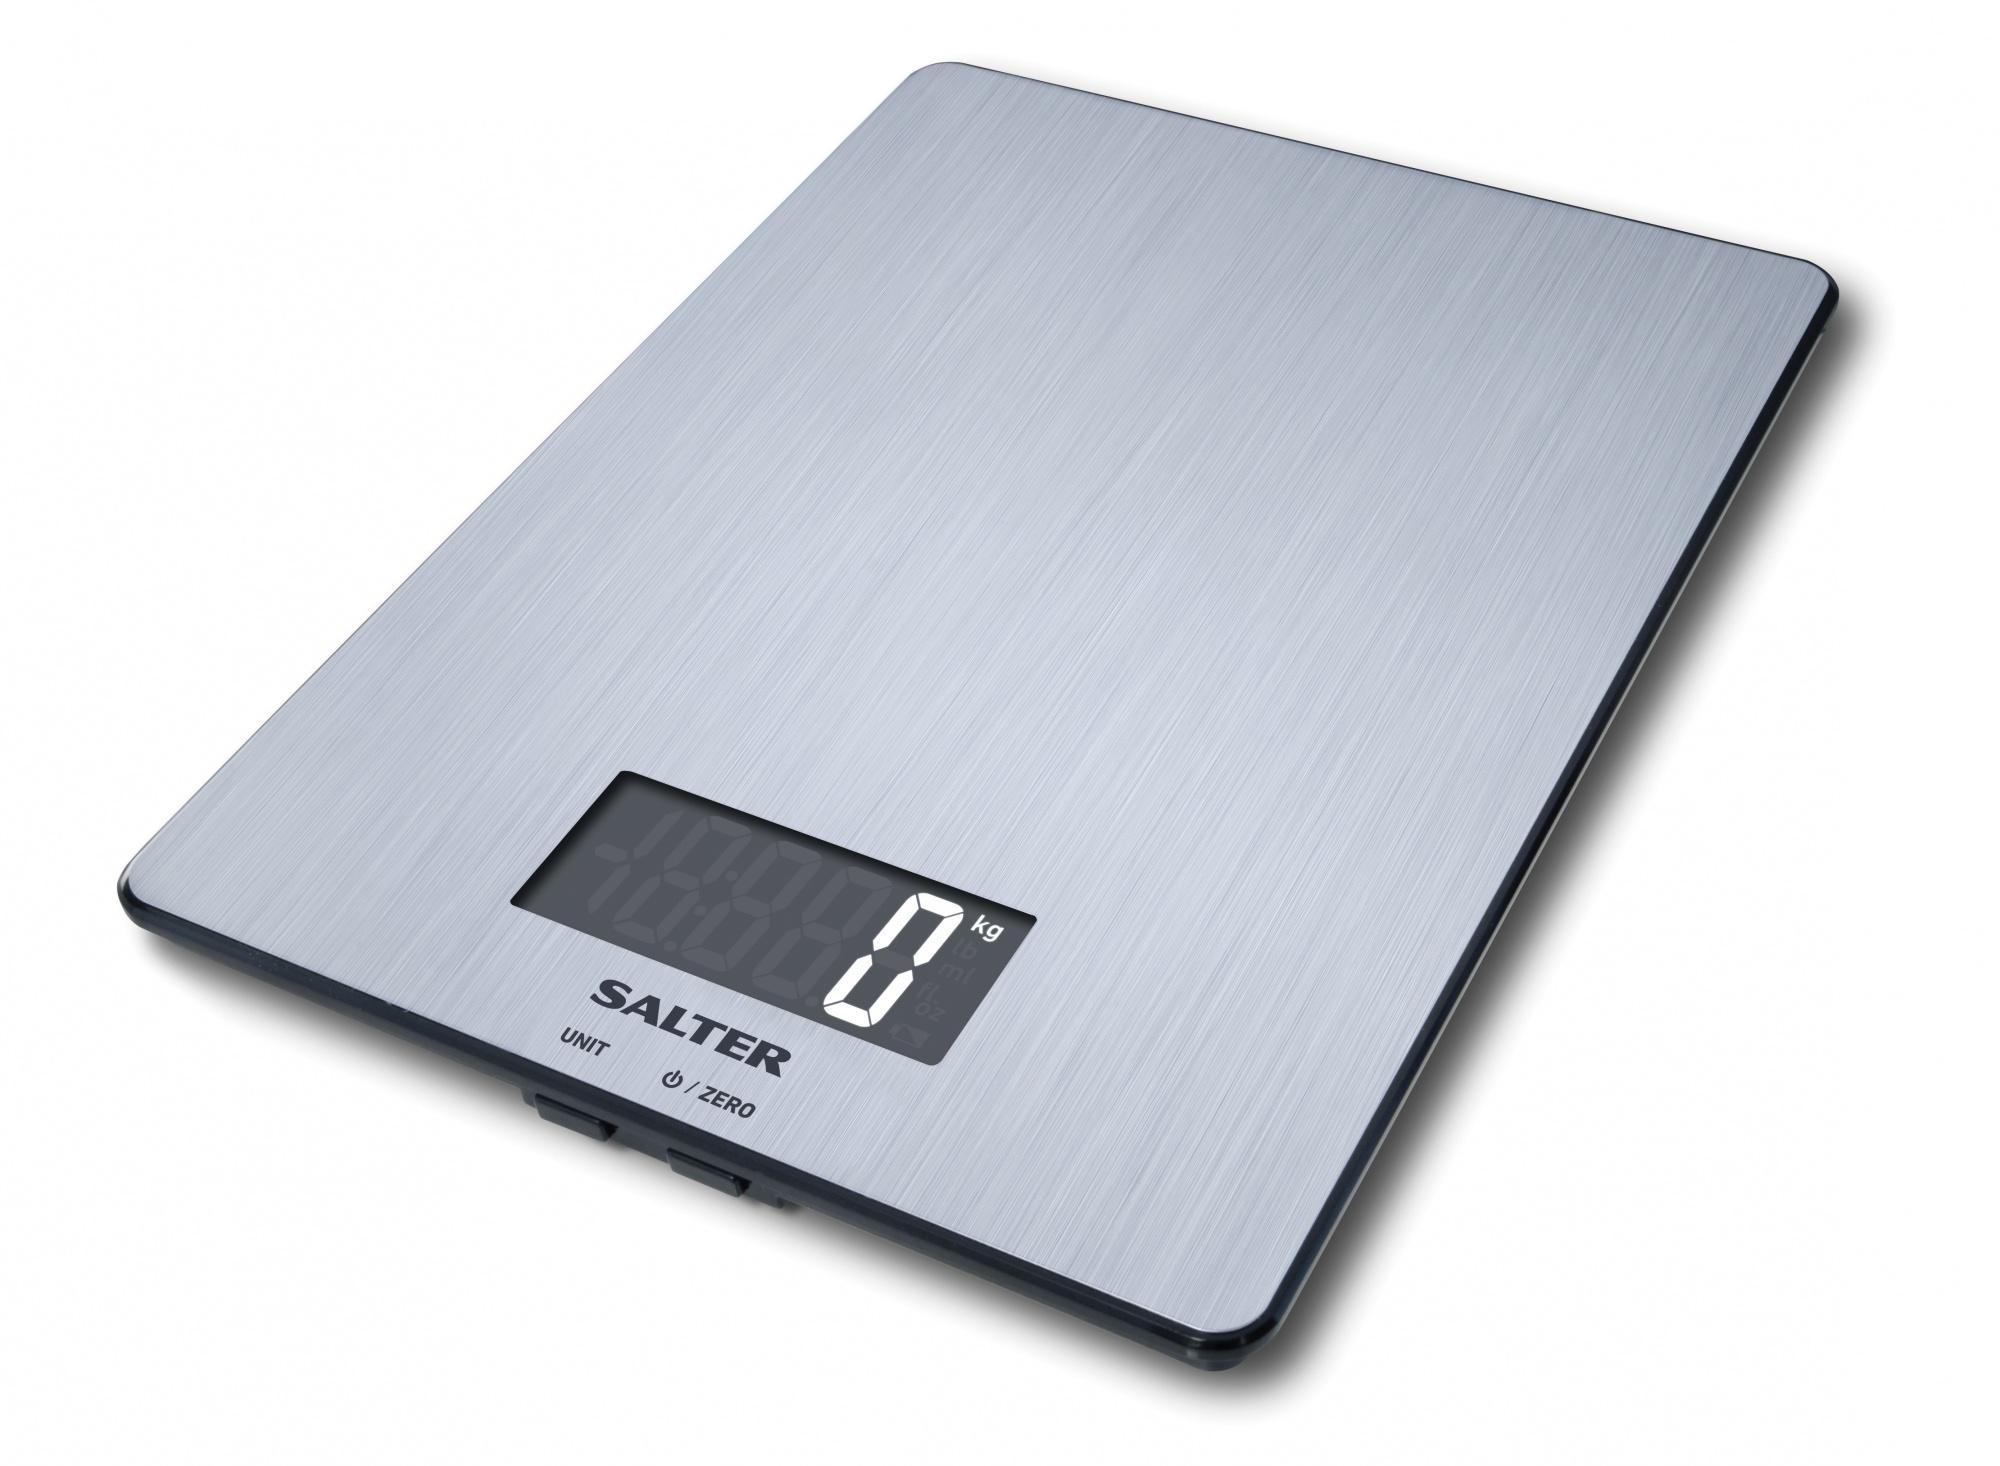 Salter Kitchen Scales Kitchen: Buy Online from Fishpond.com.au